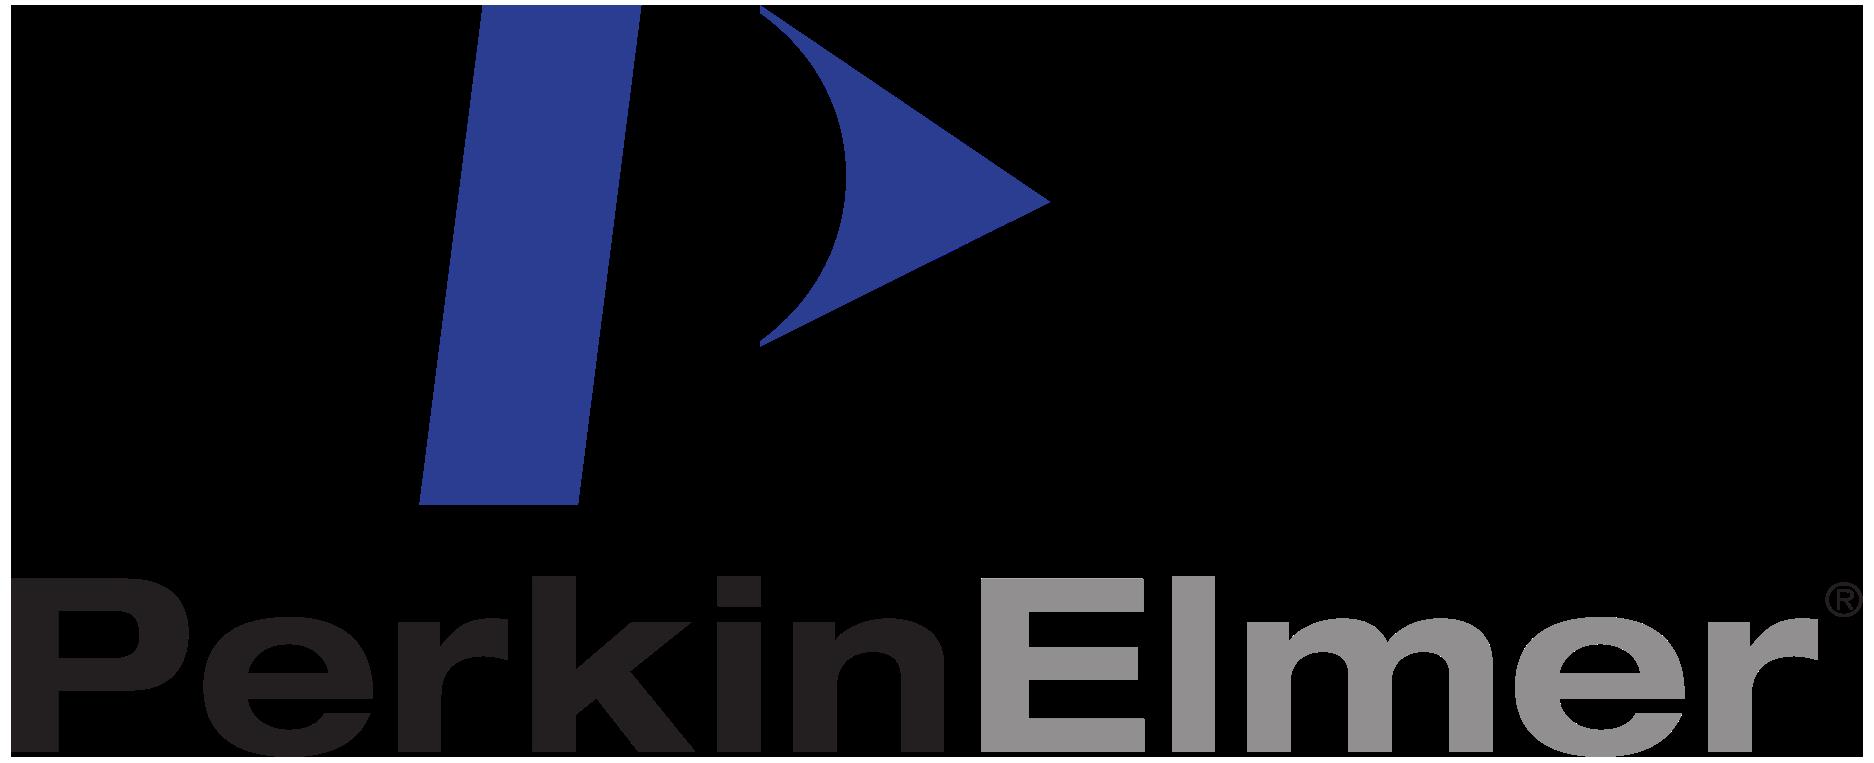 PerkinElmer_Logo